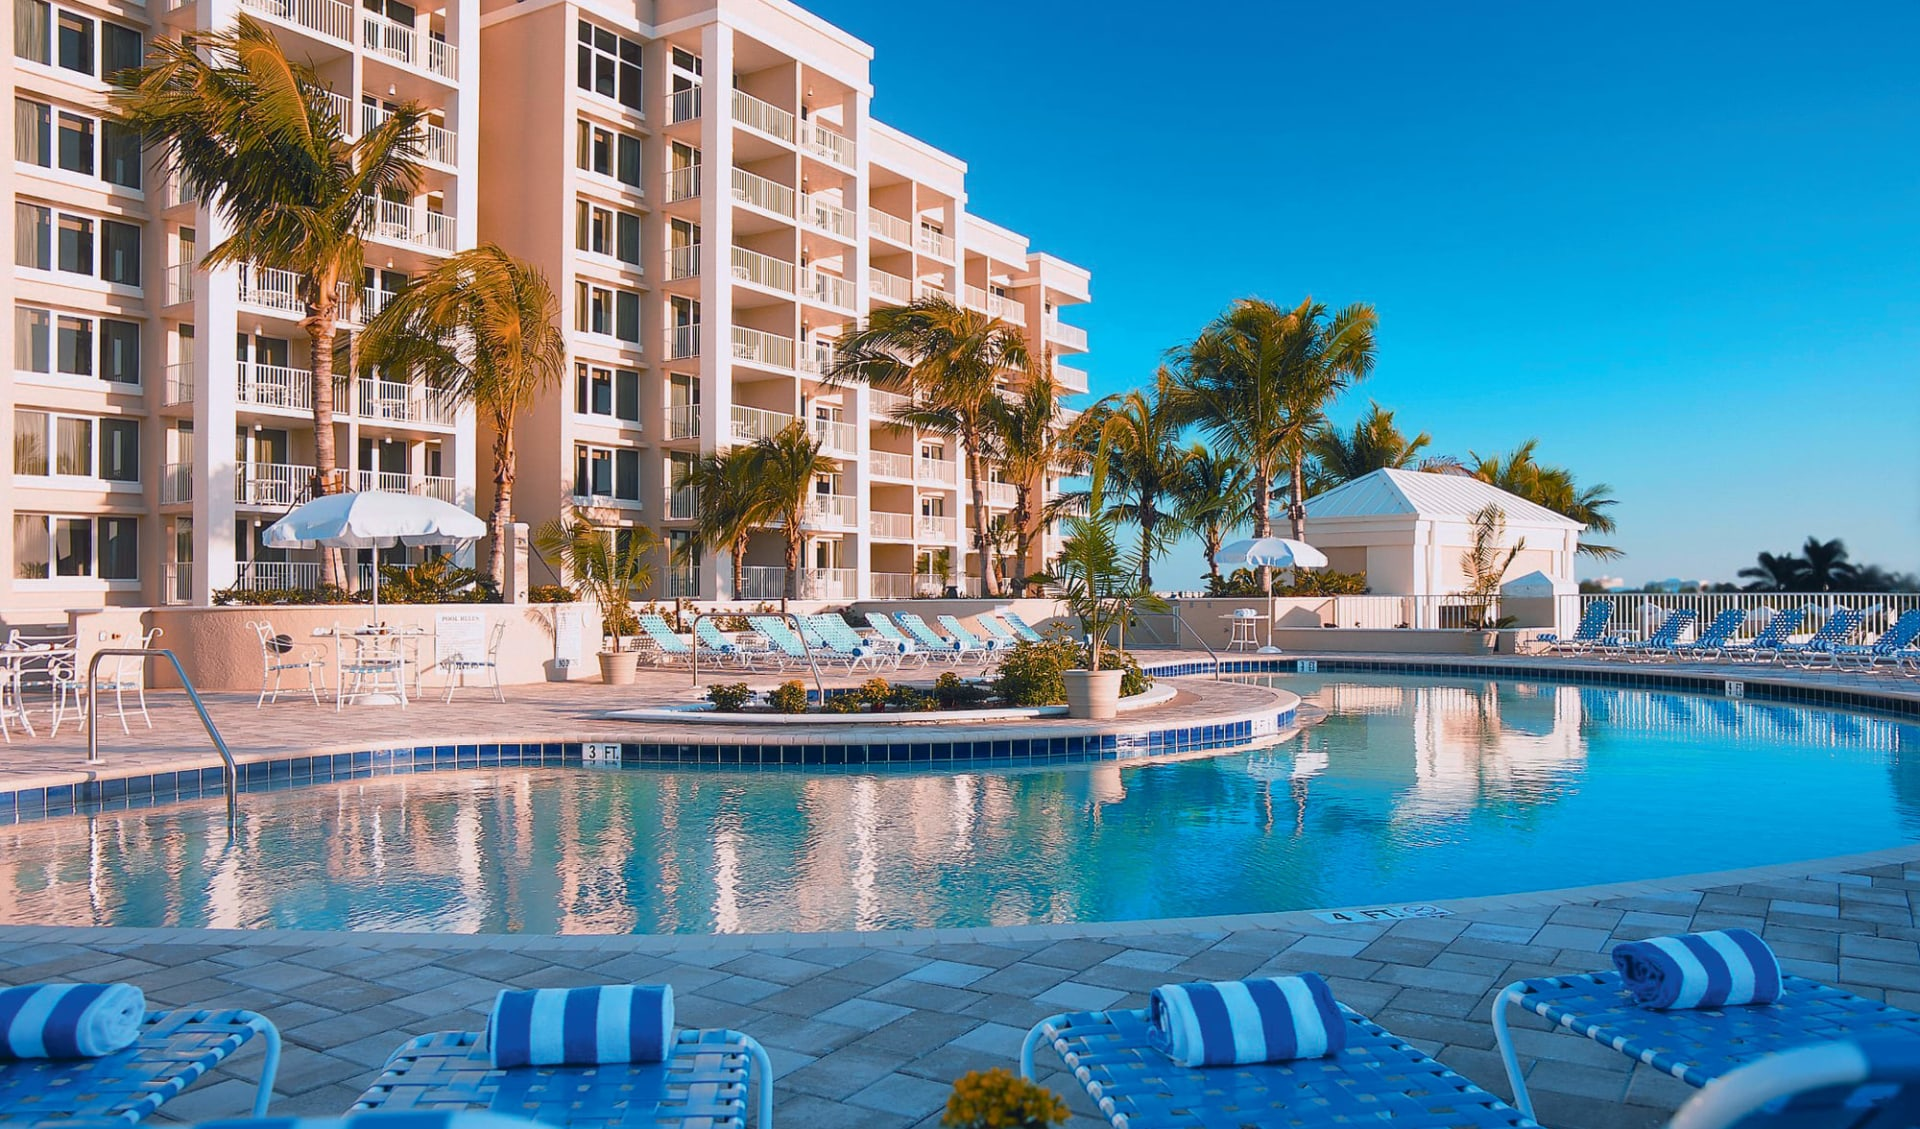 Marco Beach Ocean Resort in Marco Island: exterior marco beach ocean resort pool